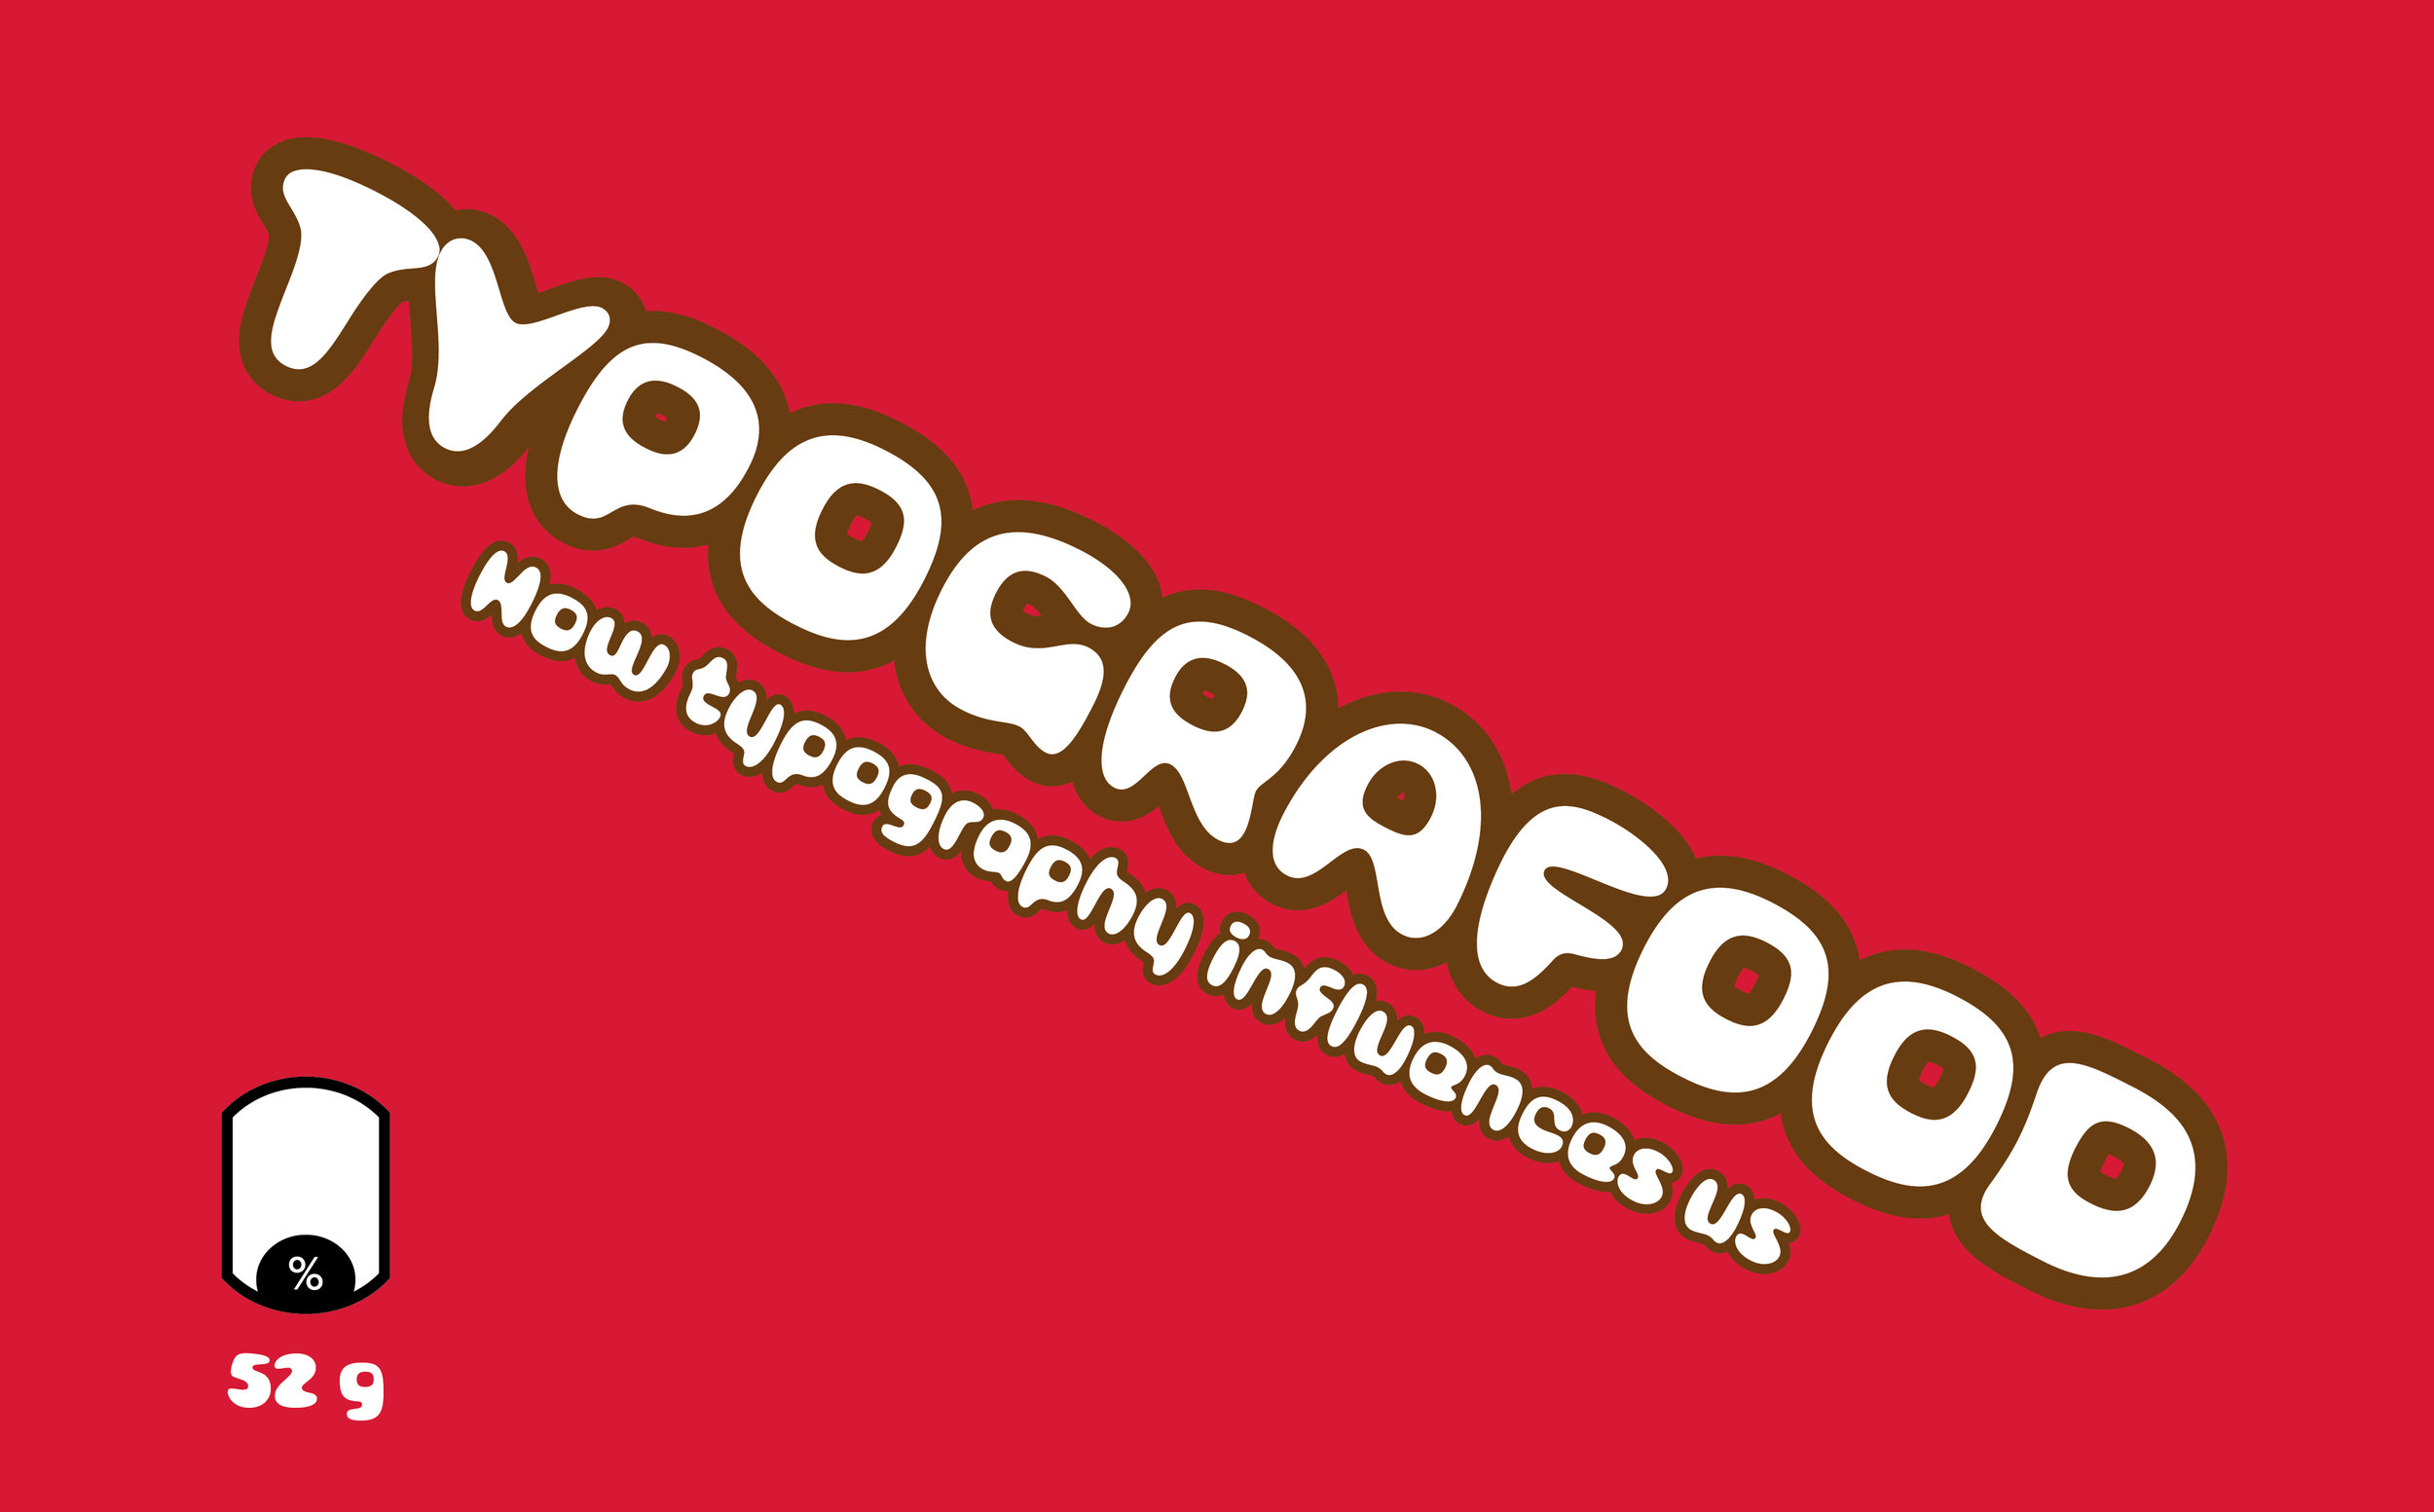 00 Typografood copy.jpg